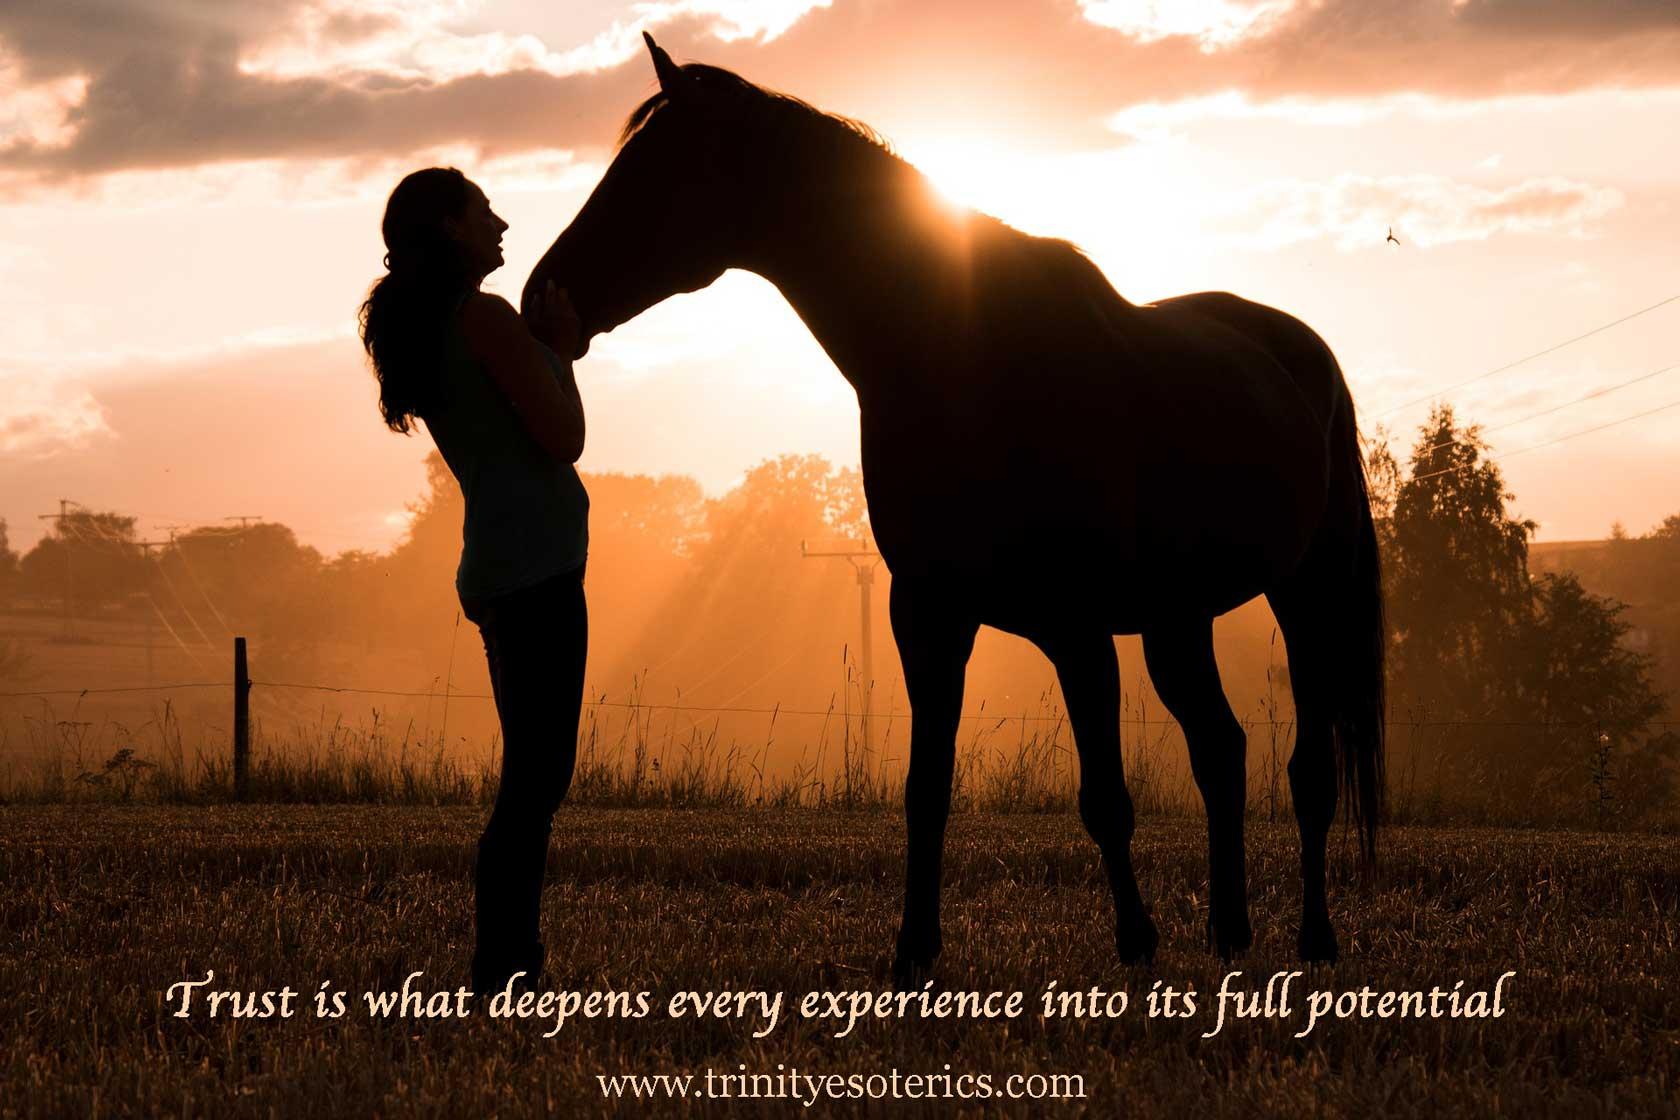 horse nuzzling woman at dusk trinity esoterics